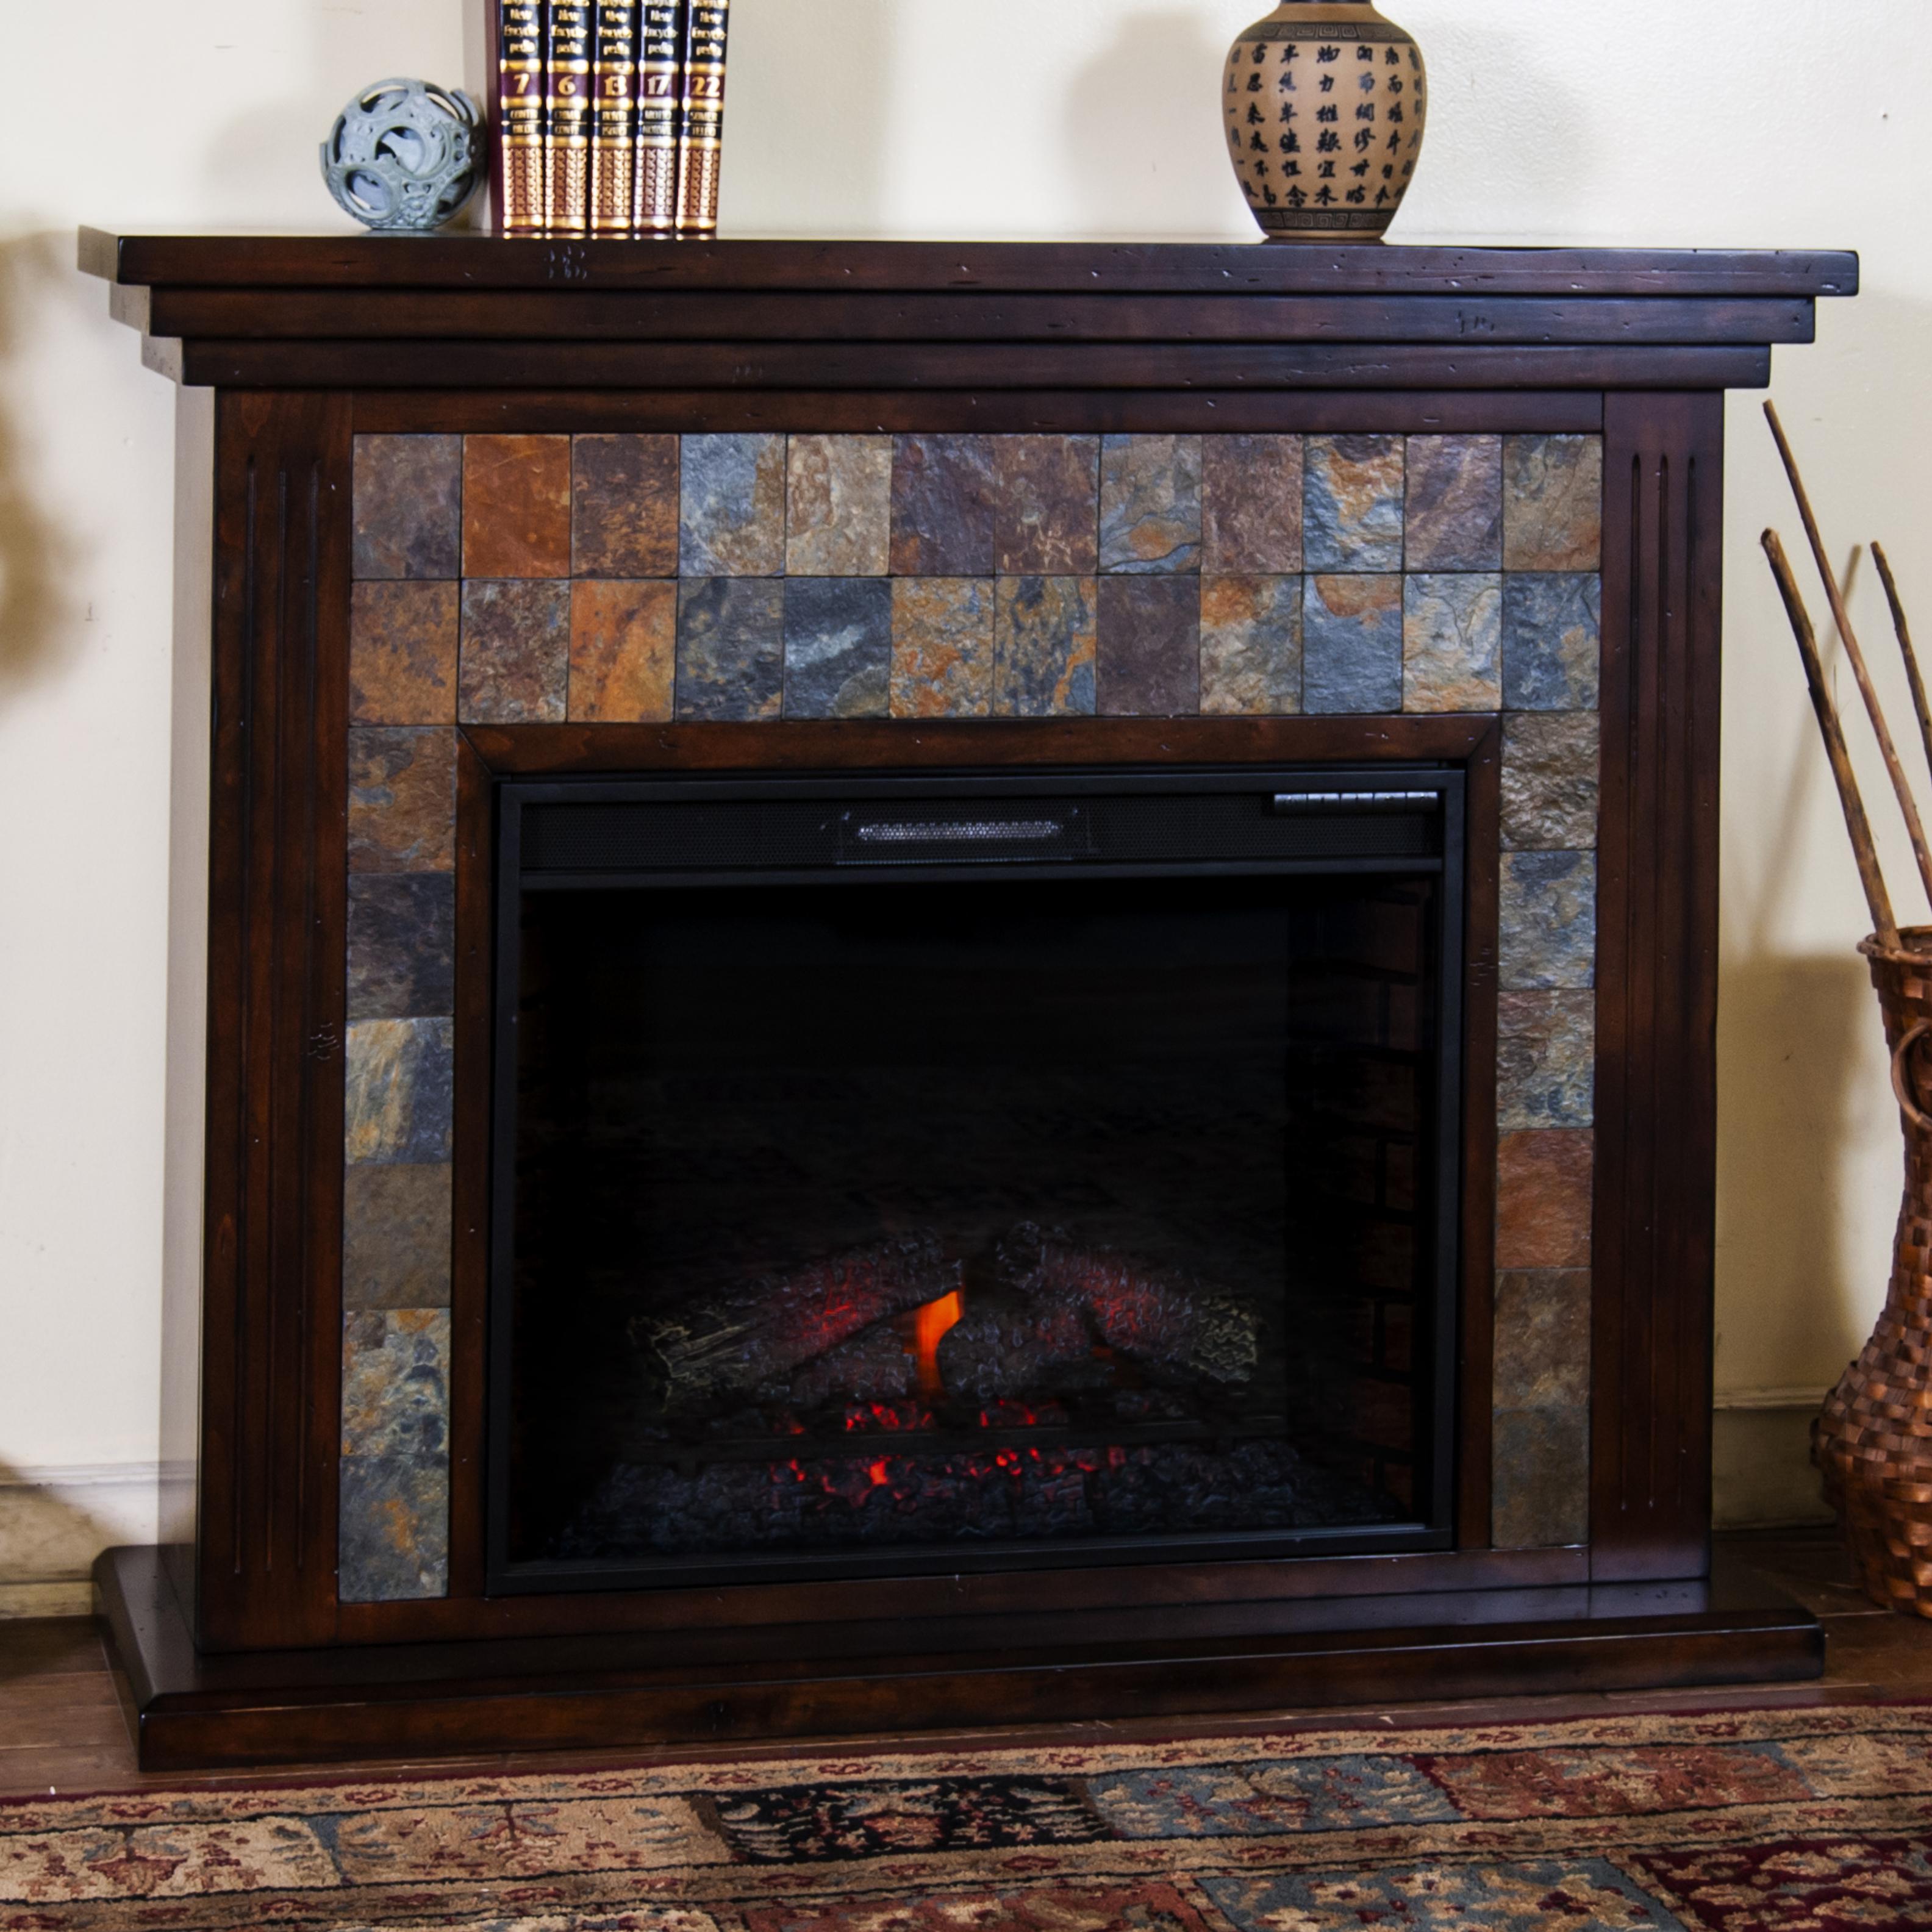 sunny designs santa fe fireplace media console w 28 firebox with rh furnituremartco com fireplace inserts denver colorado fireplace denver co